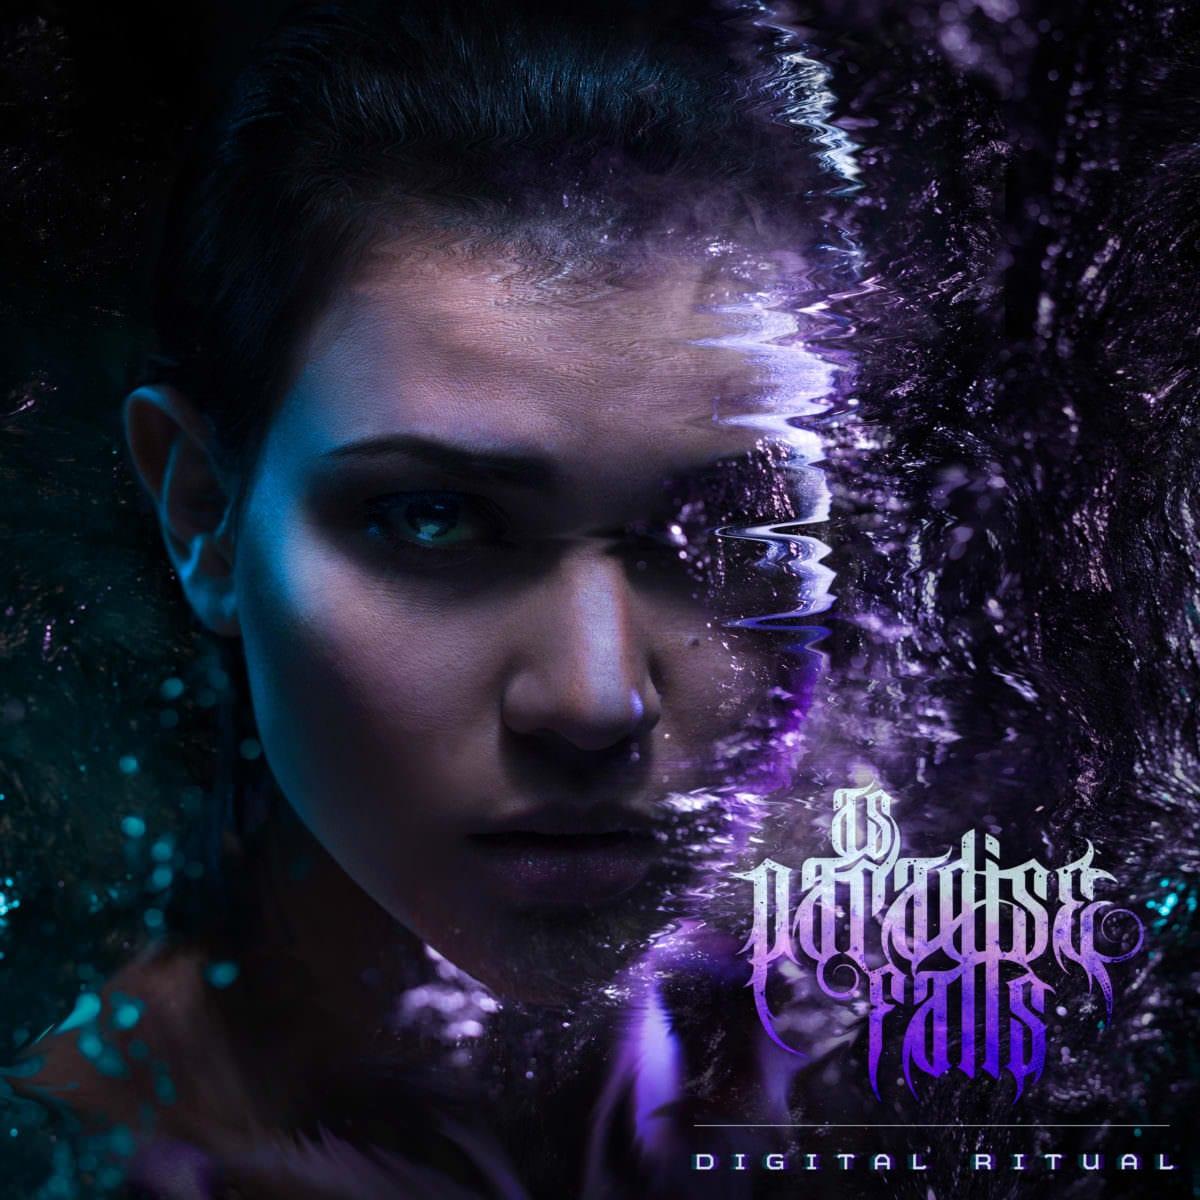 "As Paradise Falls ""Digital Ritual"" Album Cover"